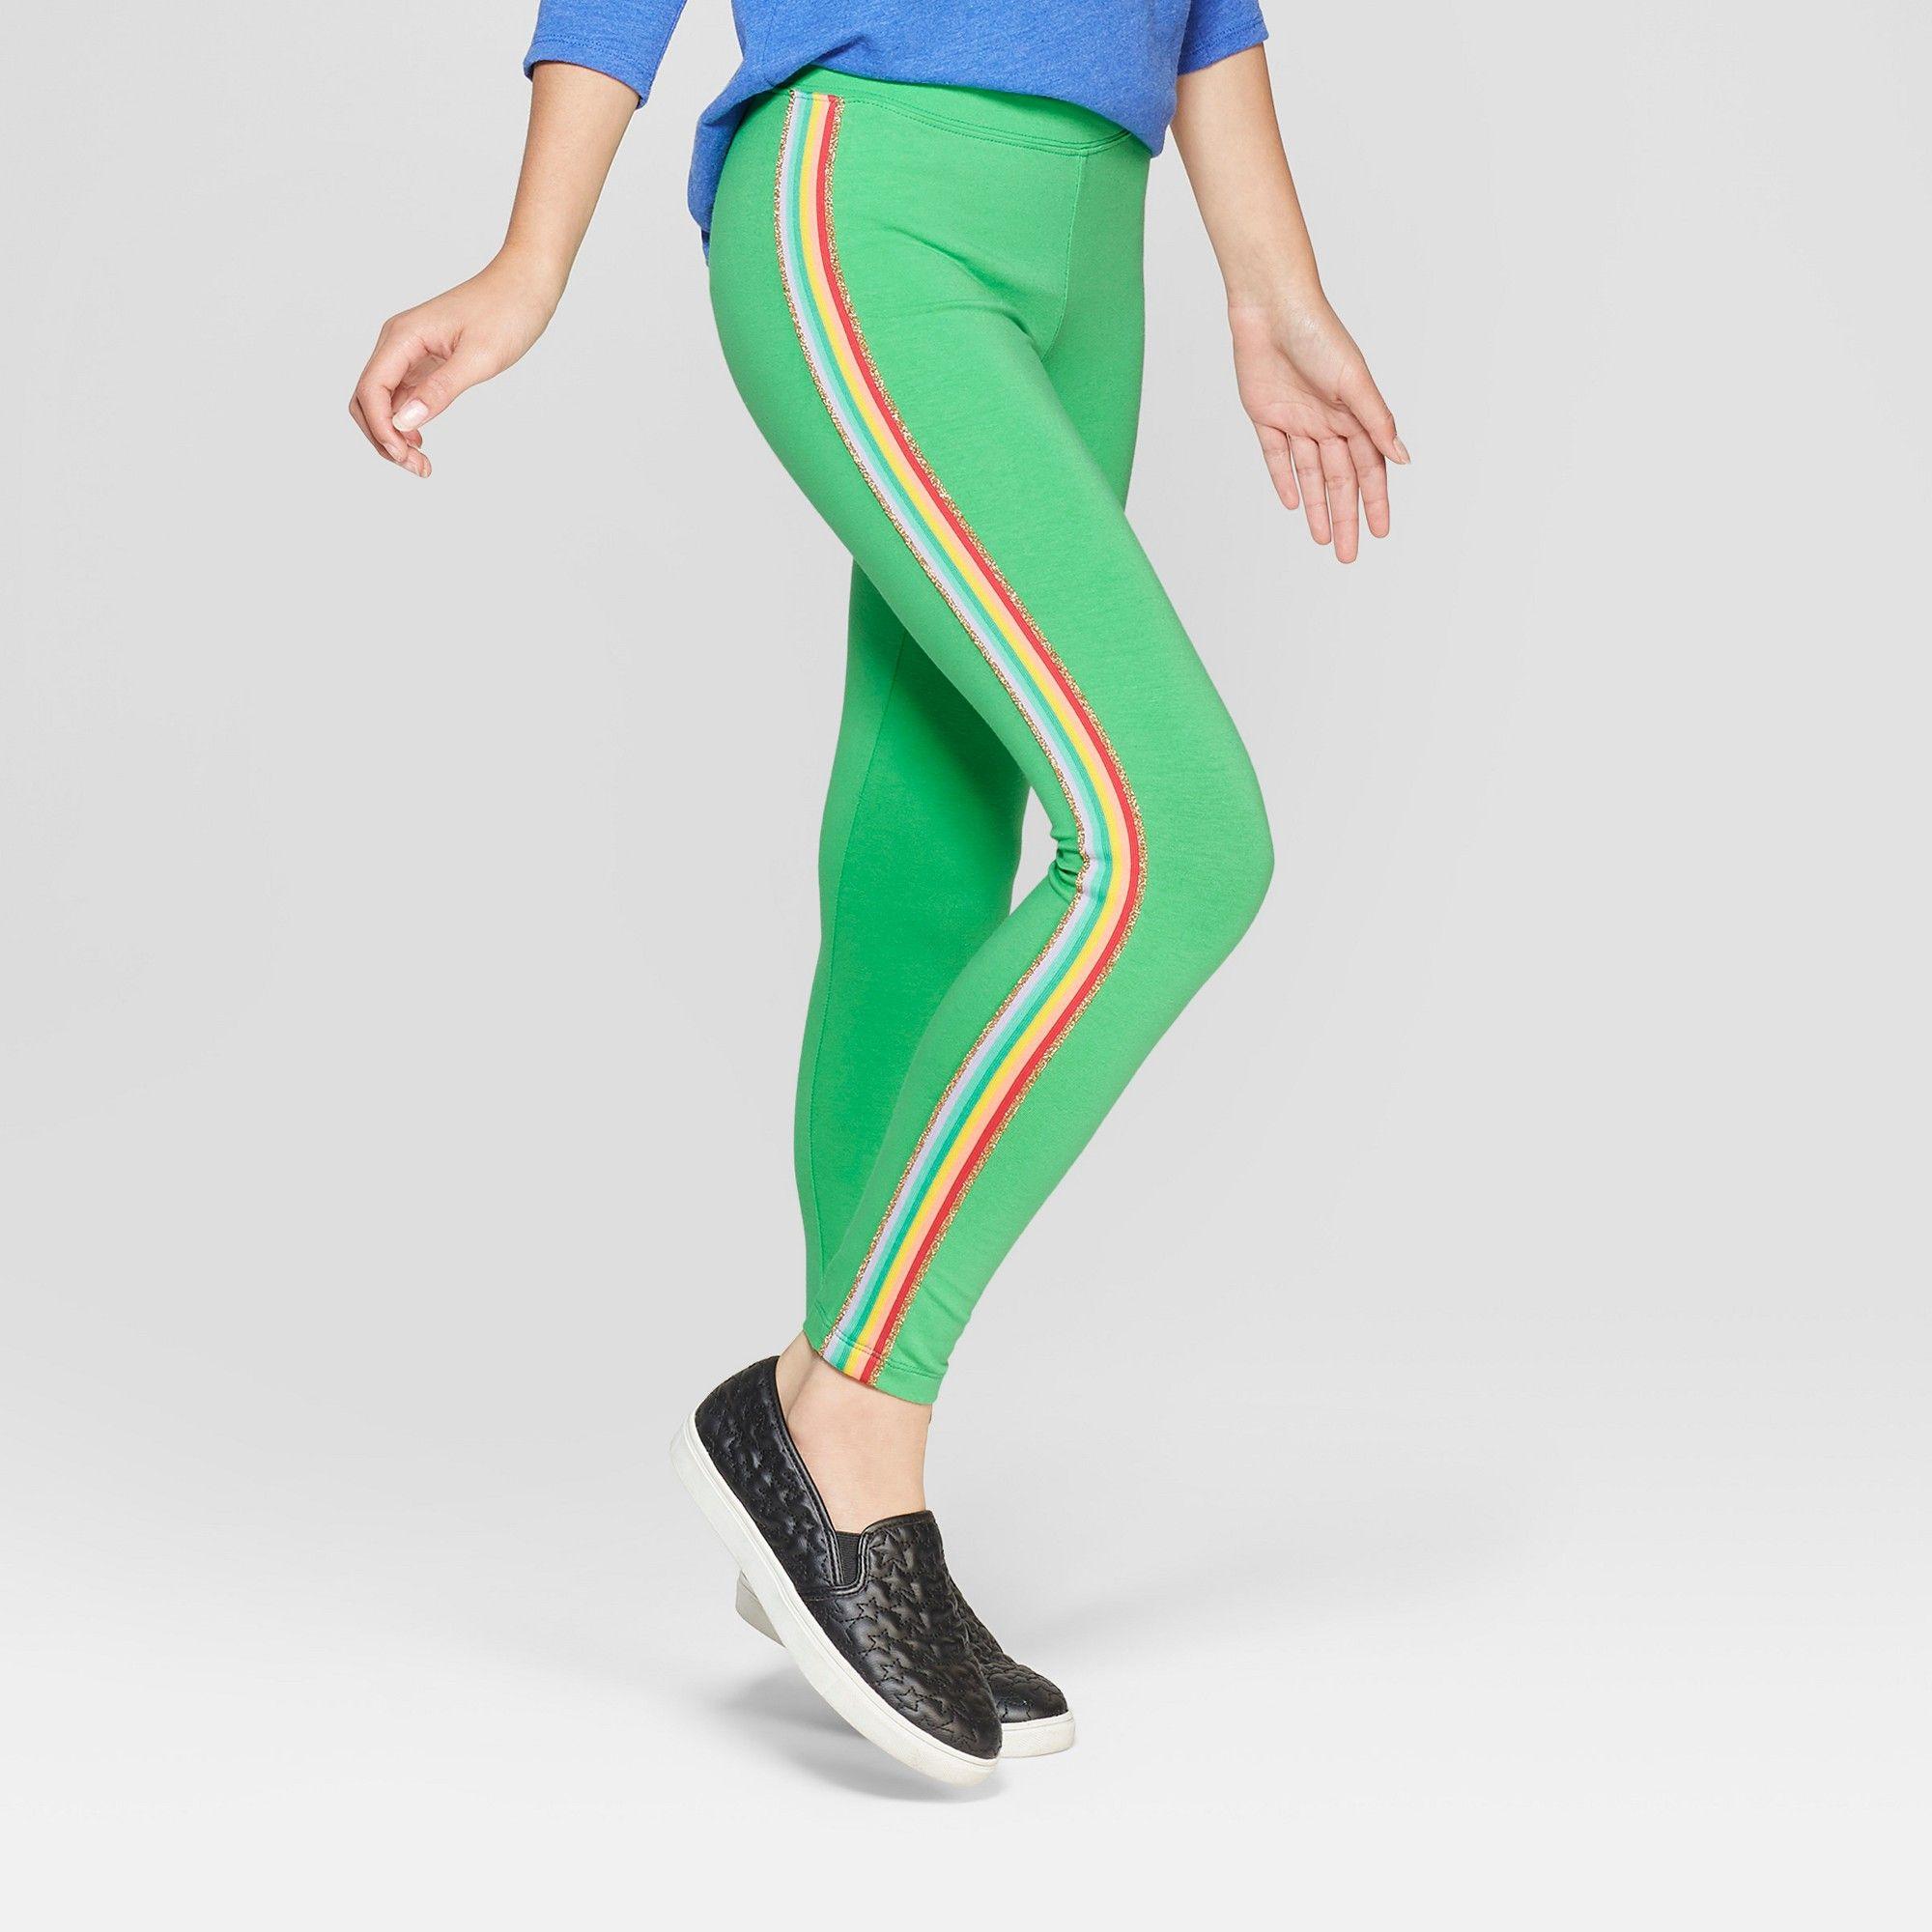 f51c5a1b79c Girls  Rainbow Side Stripe Leggings - Cat   Jack Green XL